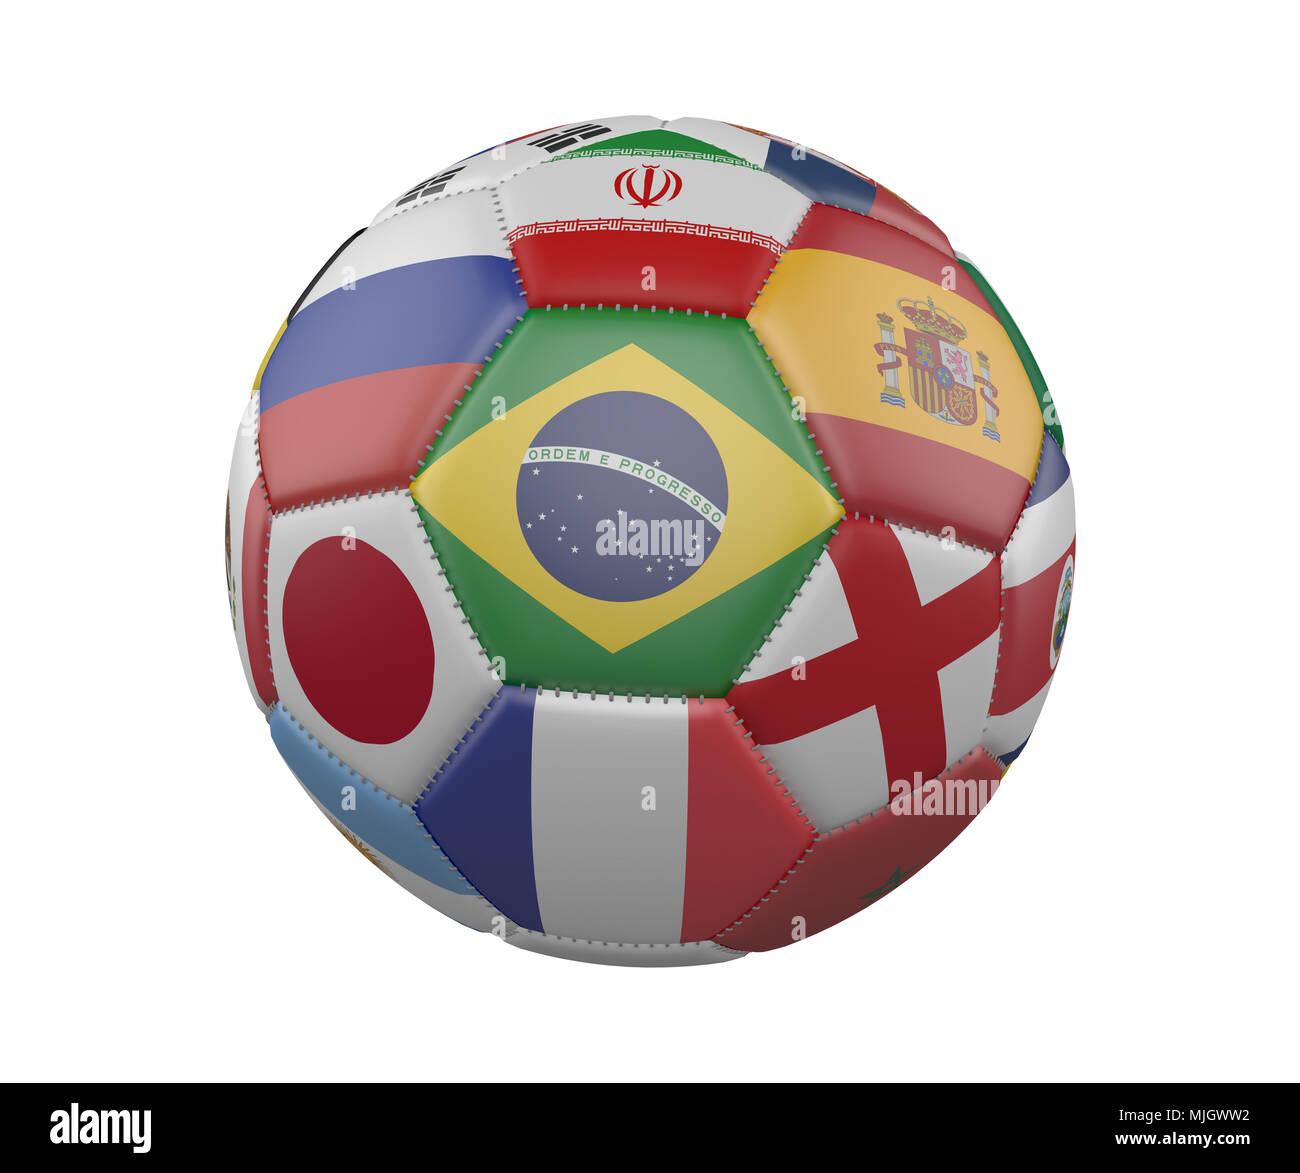 5a44f7c2c8d5f Illustration Soccer Ball Football Brazil Imágenes De Stock ...